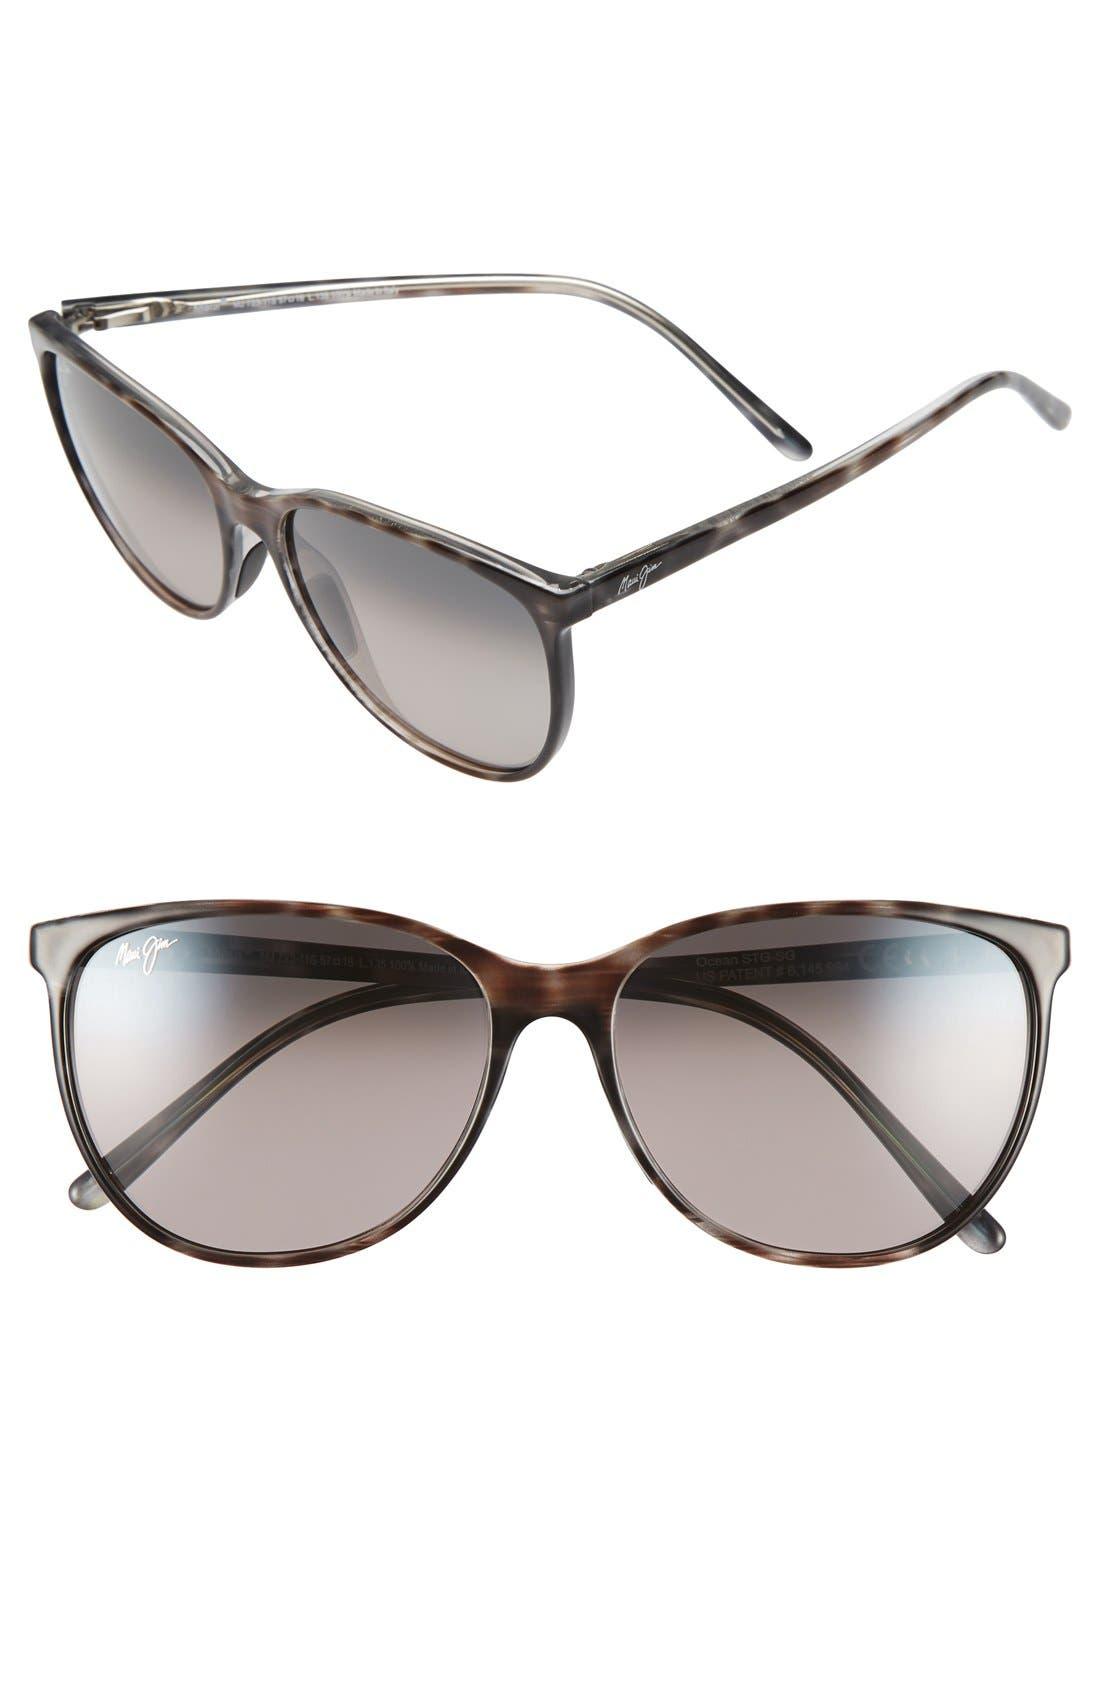 Maui Jim Ocean 57mm PolarizedPlus2® Sunglasses